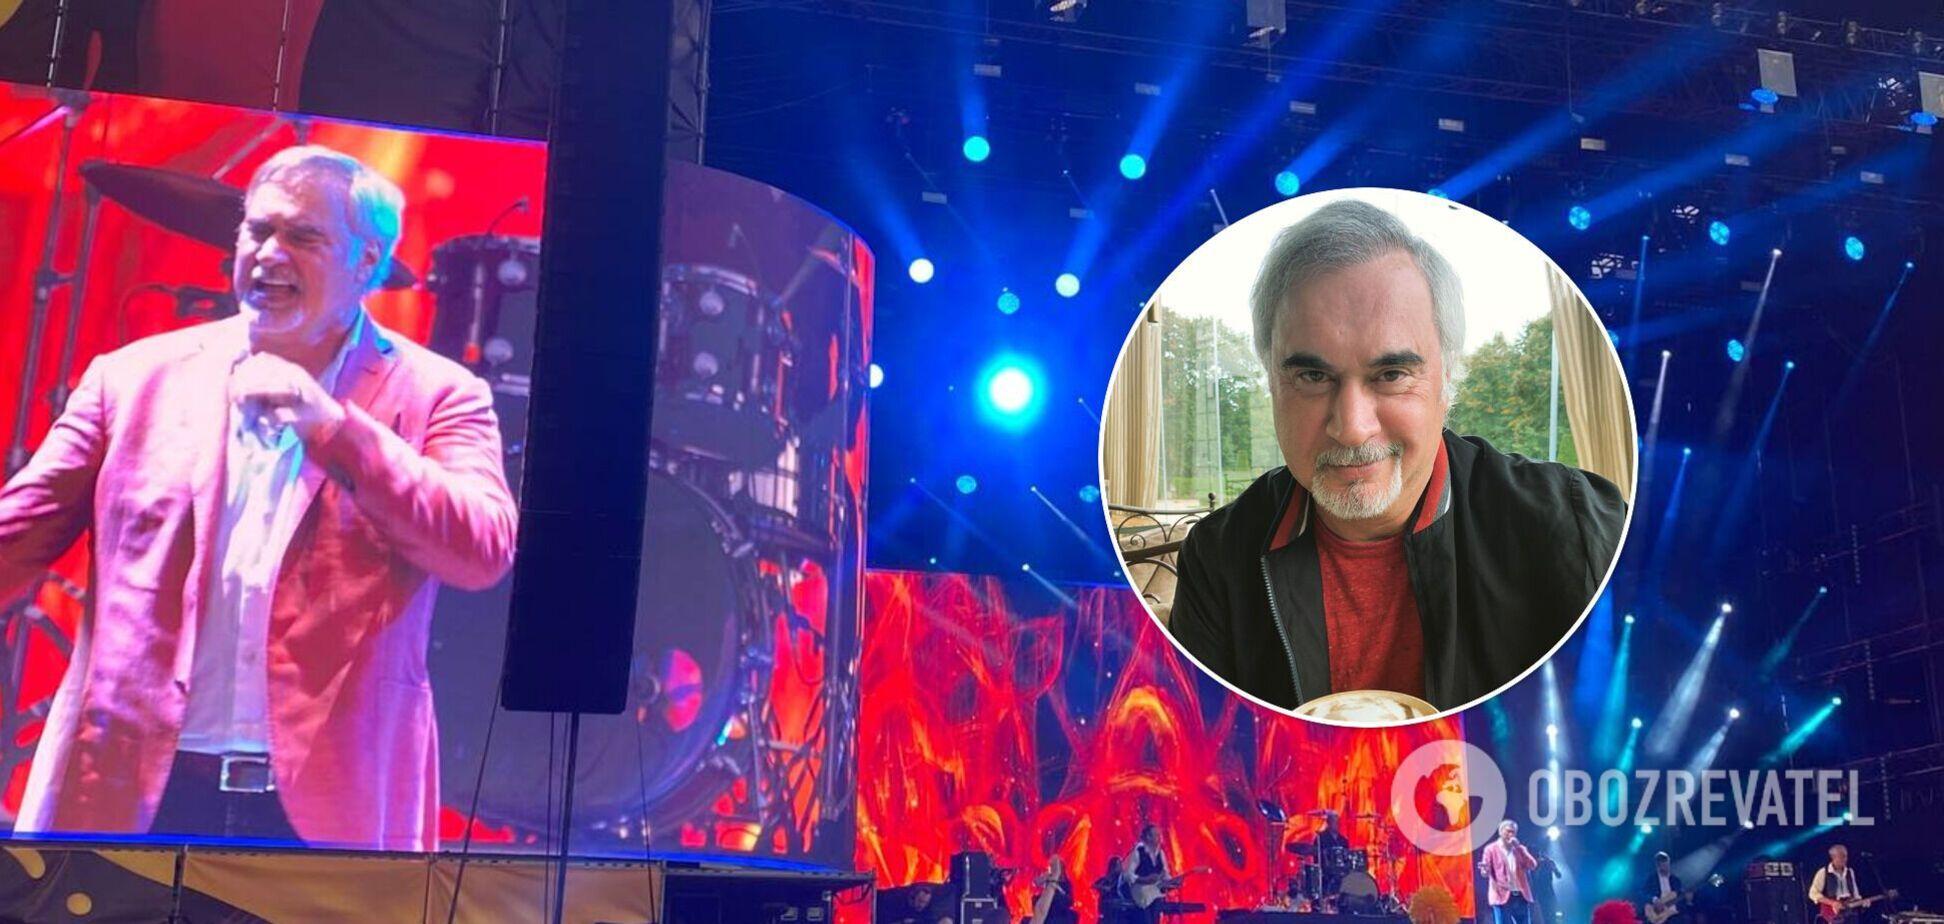 Валерий Меладзе заговорил на украинском языке на сцене Atlas Weekend 2021. Видео